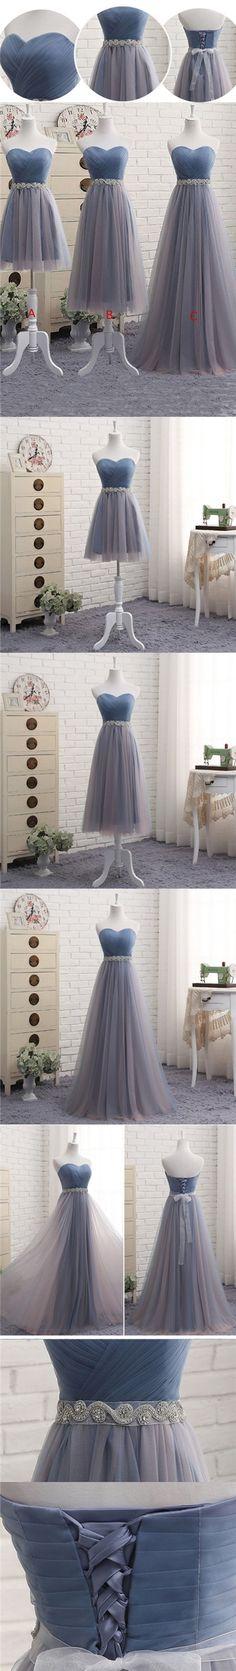 Prom Dresses Tulle A-line Sweetheart Prom Dress/Evening Dress #JKL018